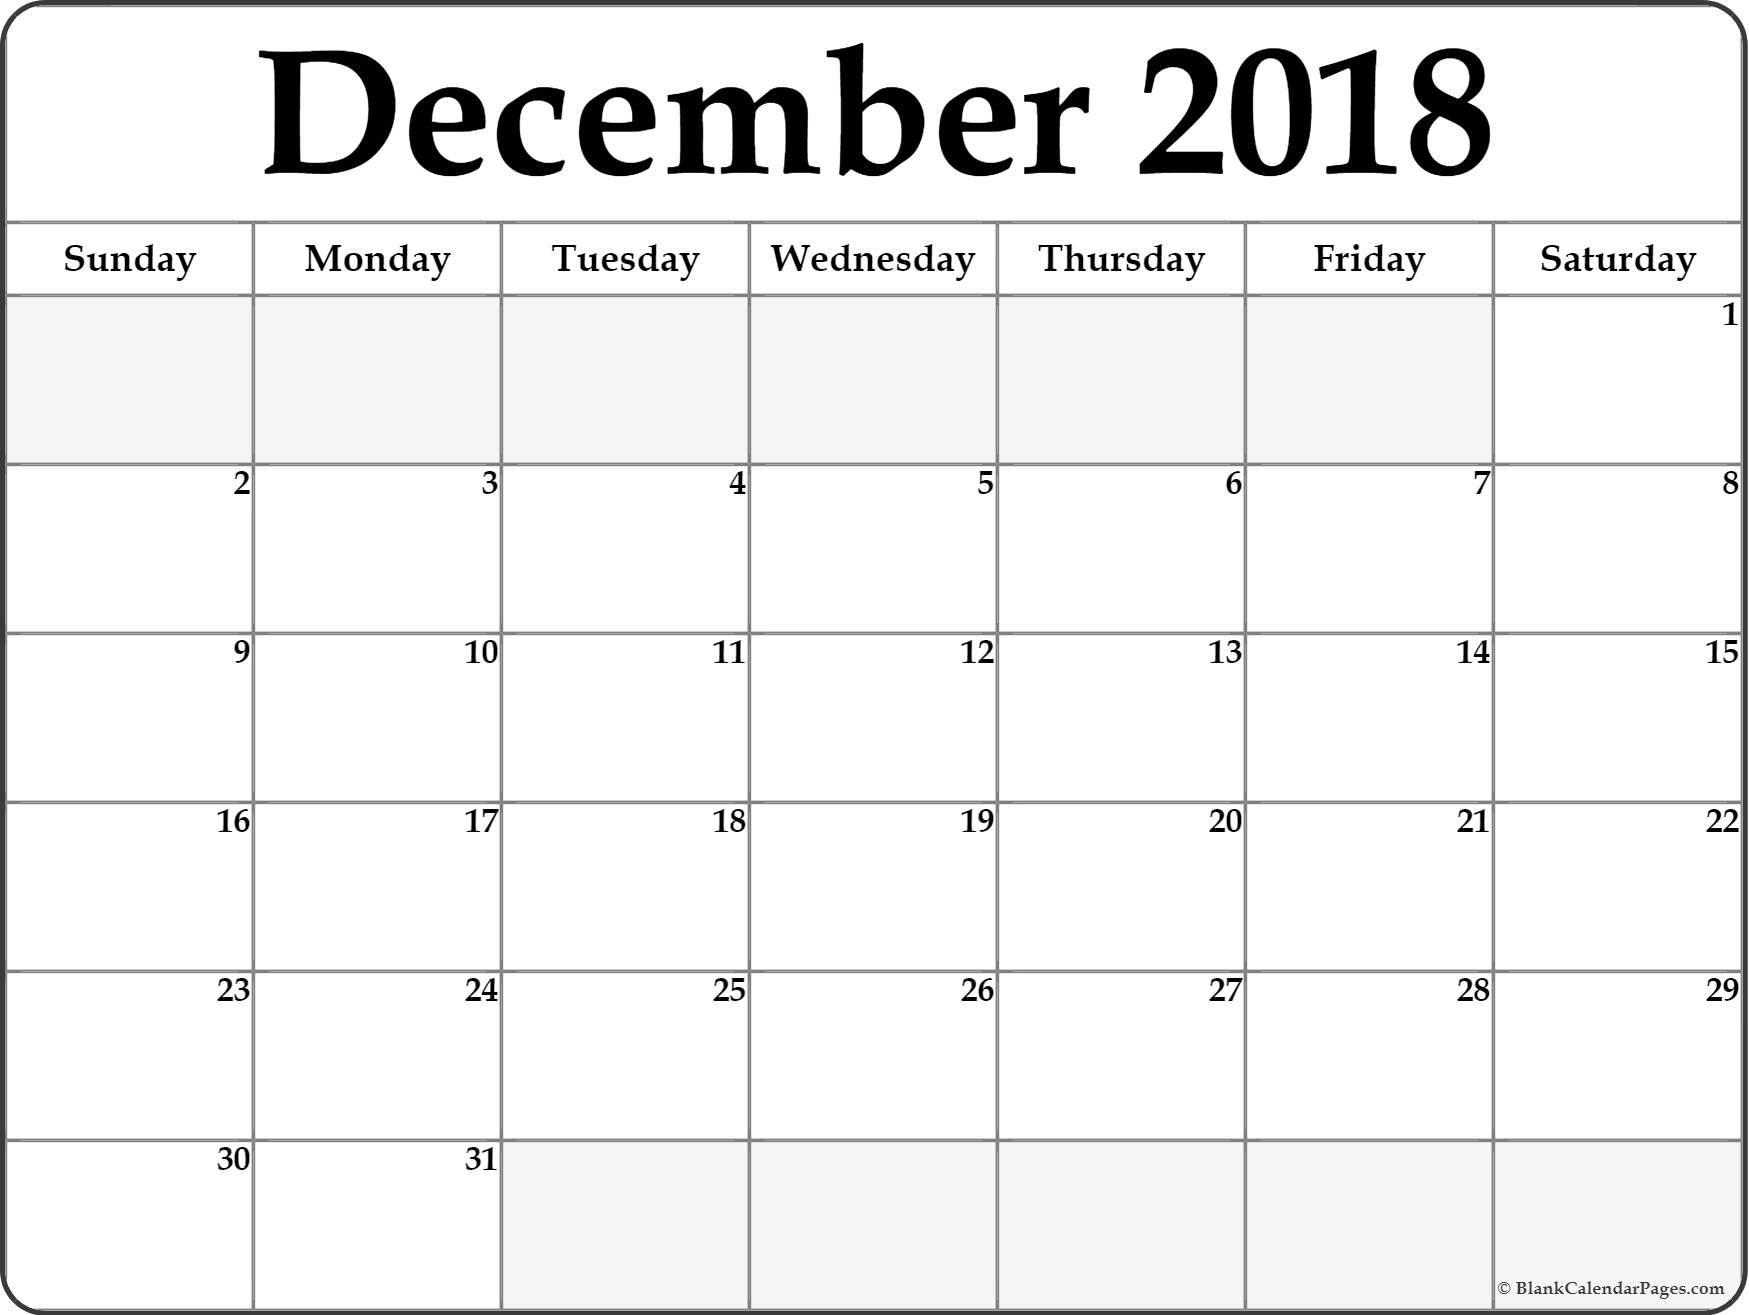 December 2018 Calendar Printable- Free Templates - Printable